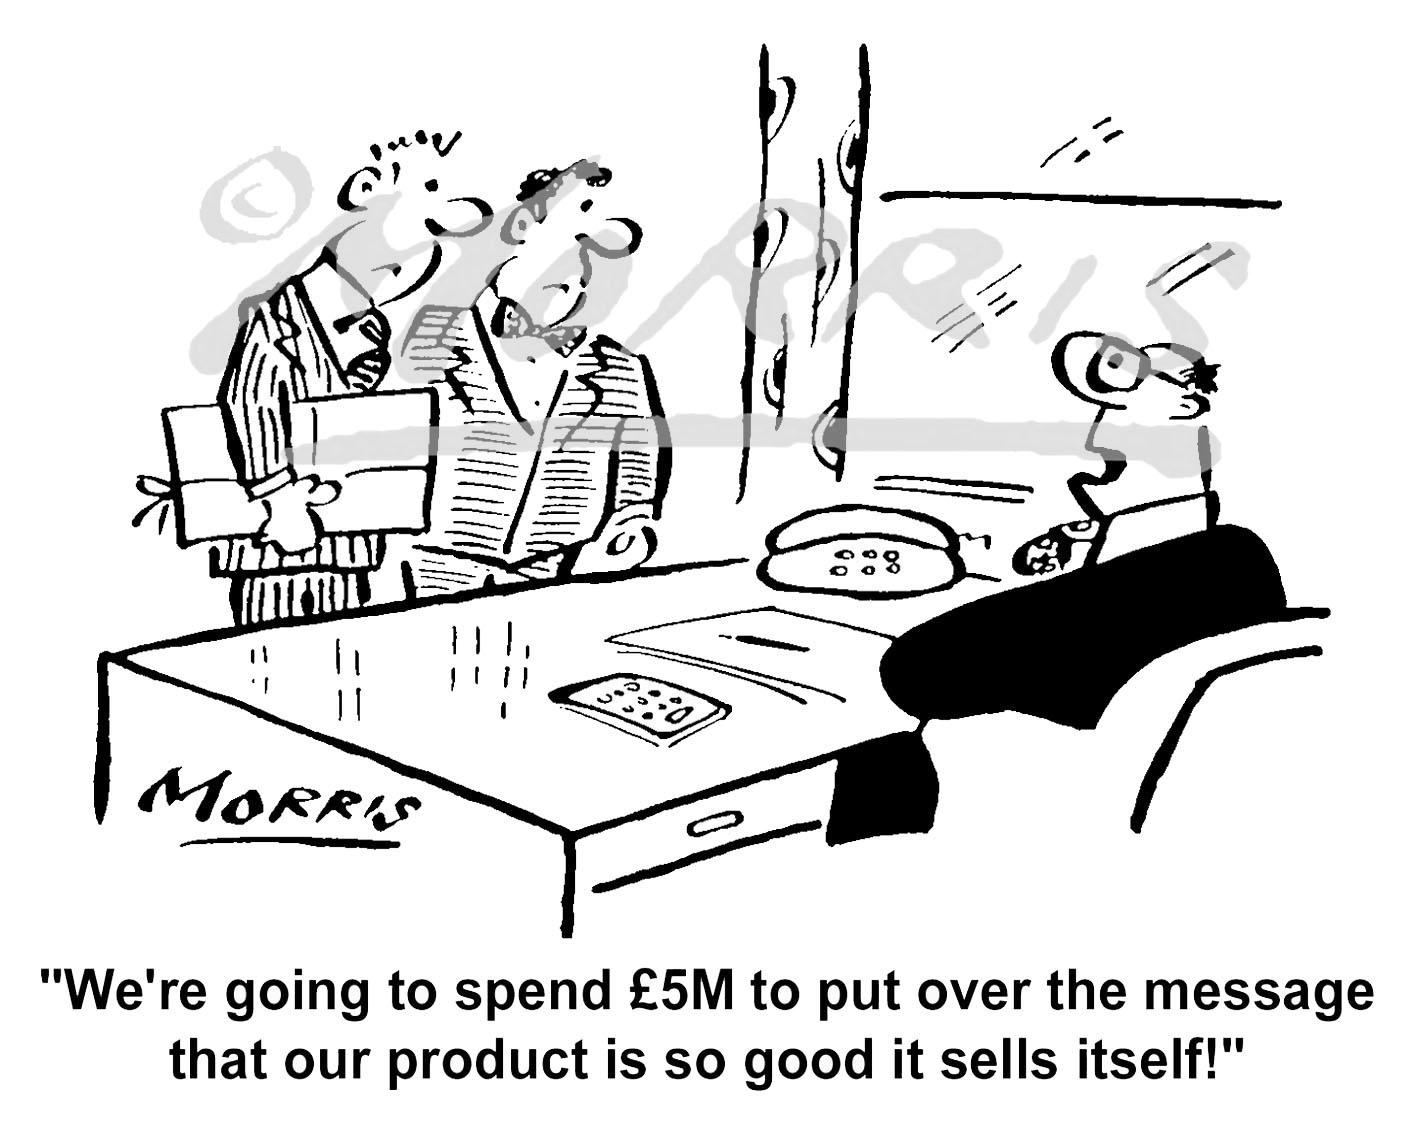 Marketing business cartoon – Ref: 4089bw